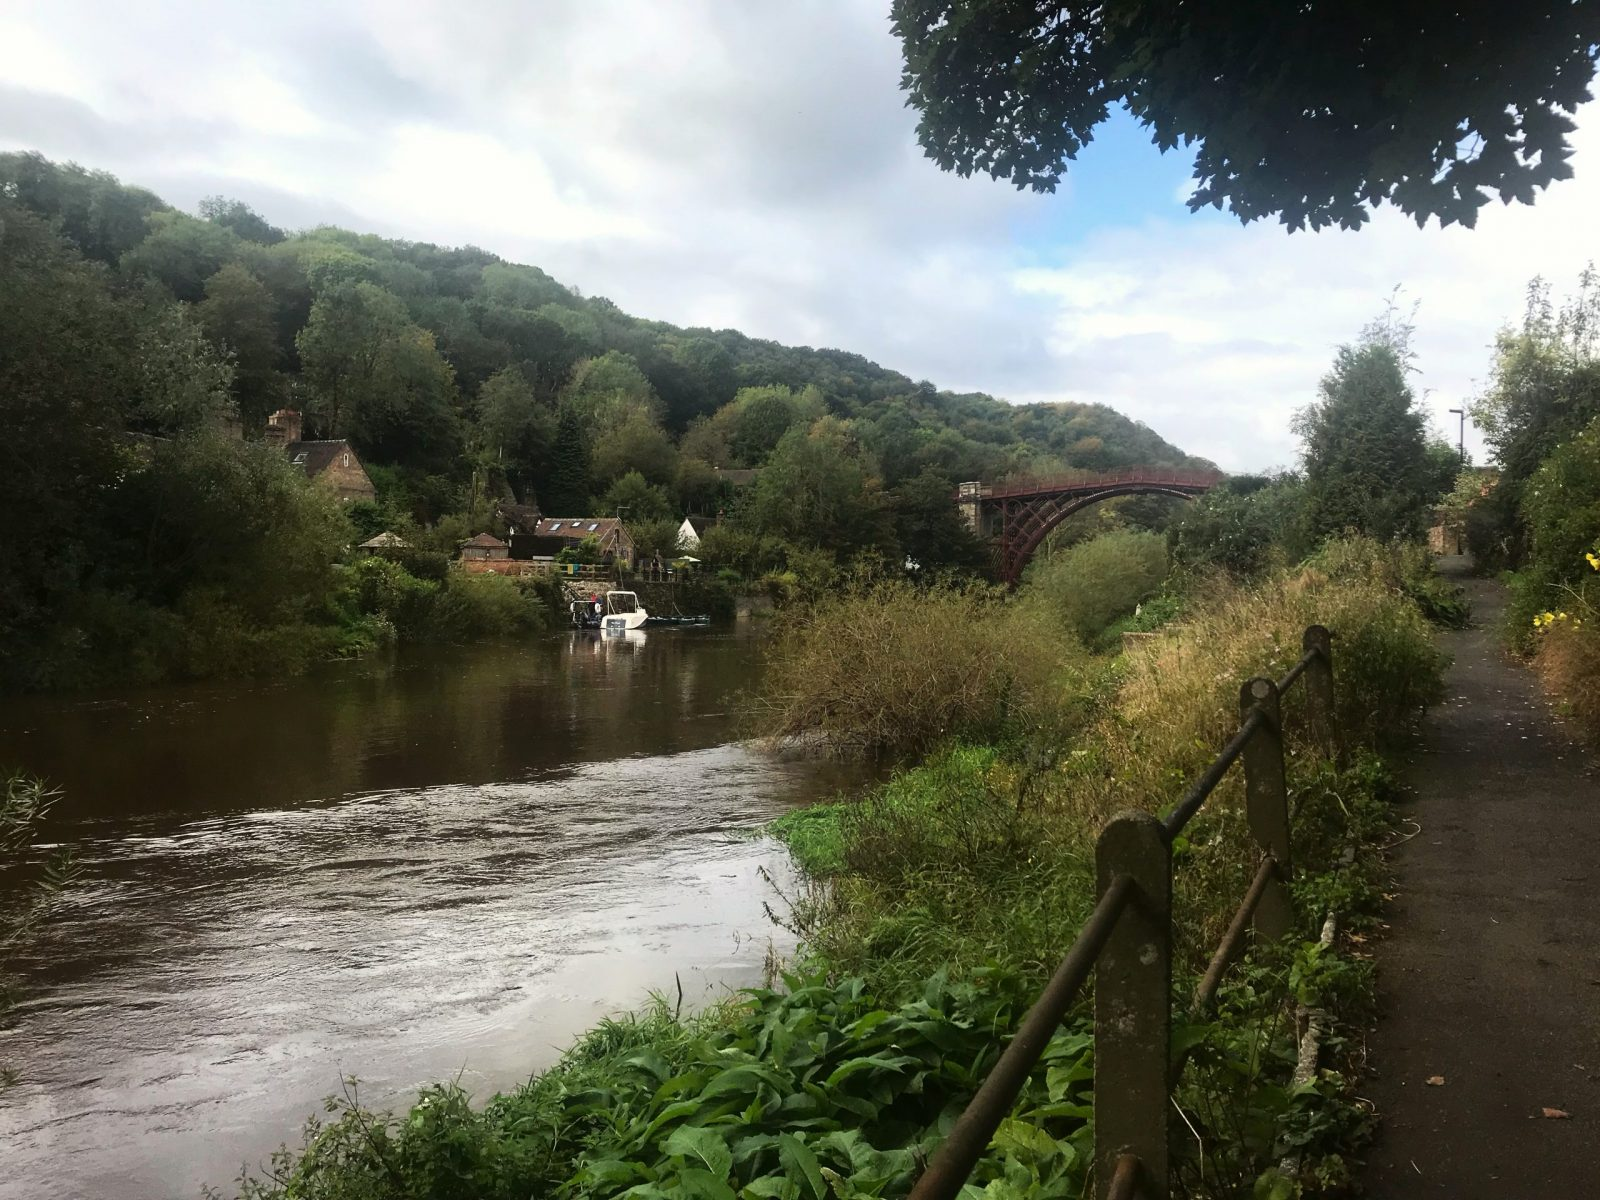 Visiting Ironbridge view